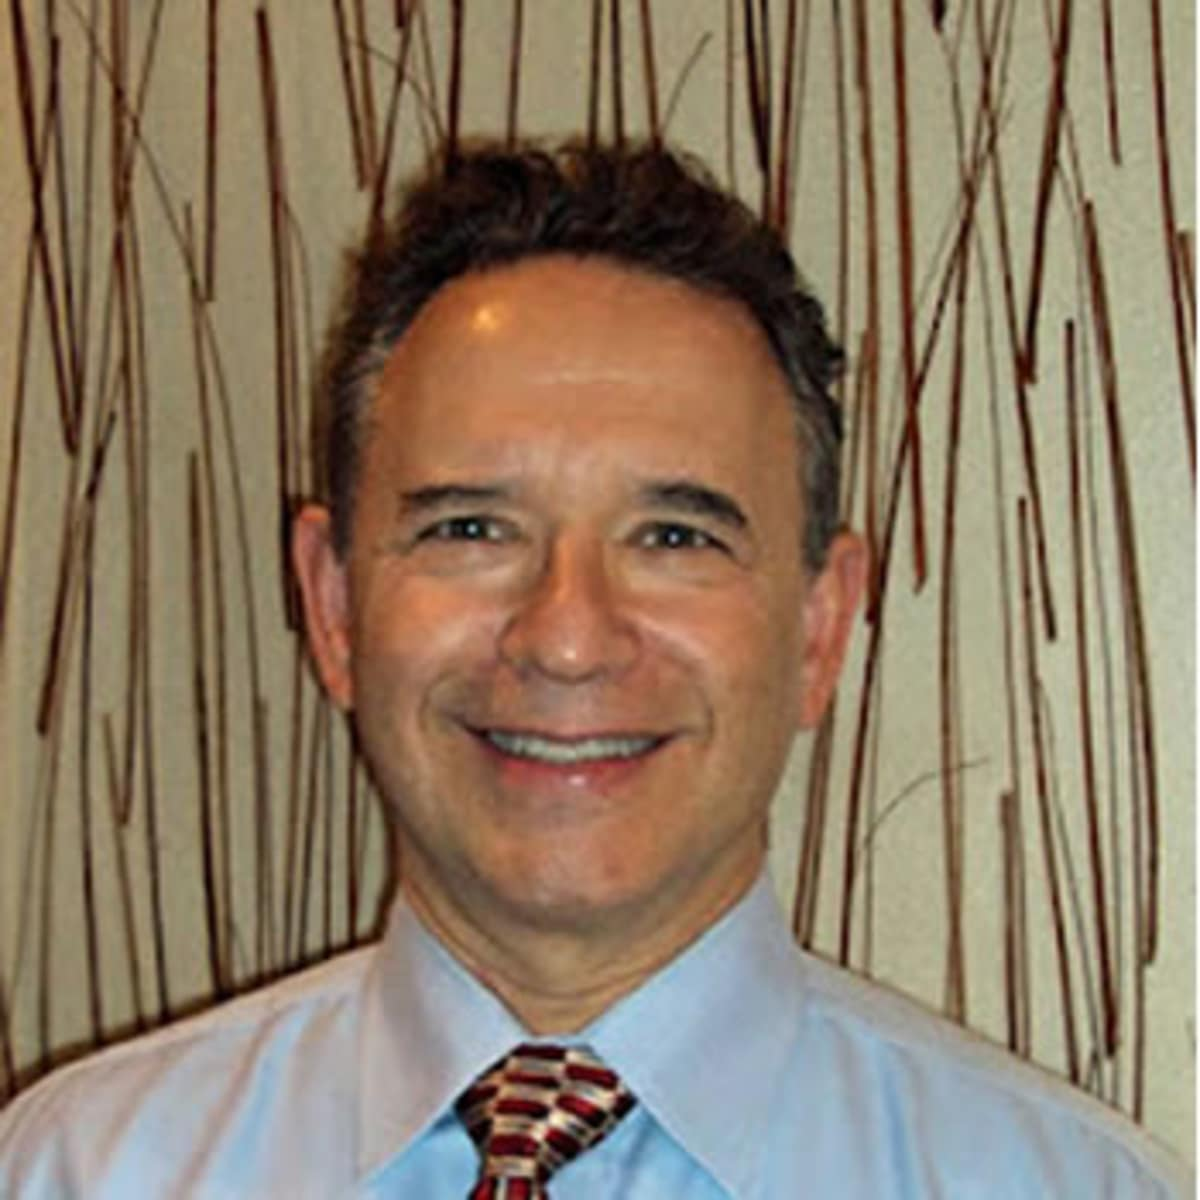 Steve Lazar dr. steve lazar, dmd, dc | las vegas, nv | general dentist